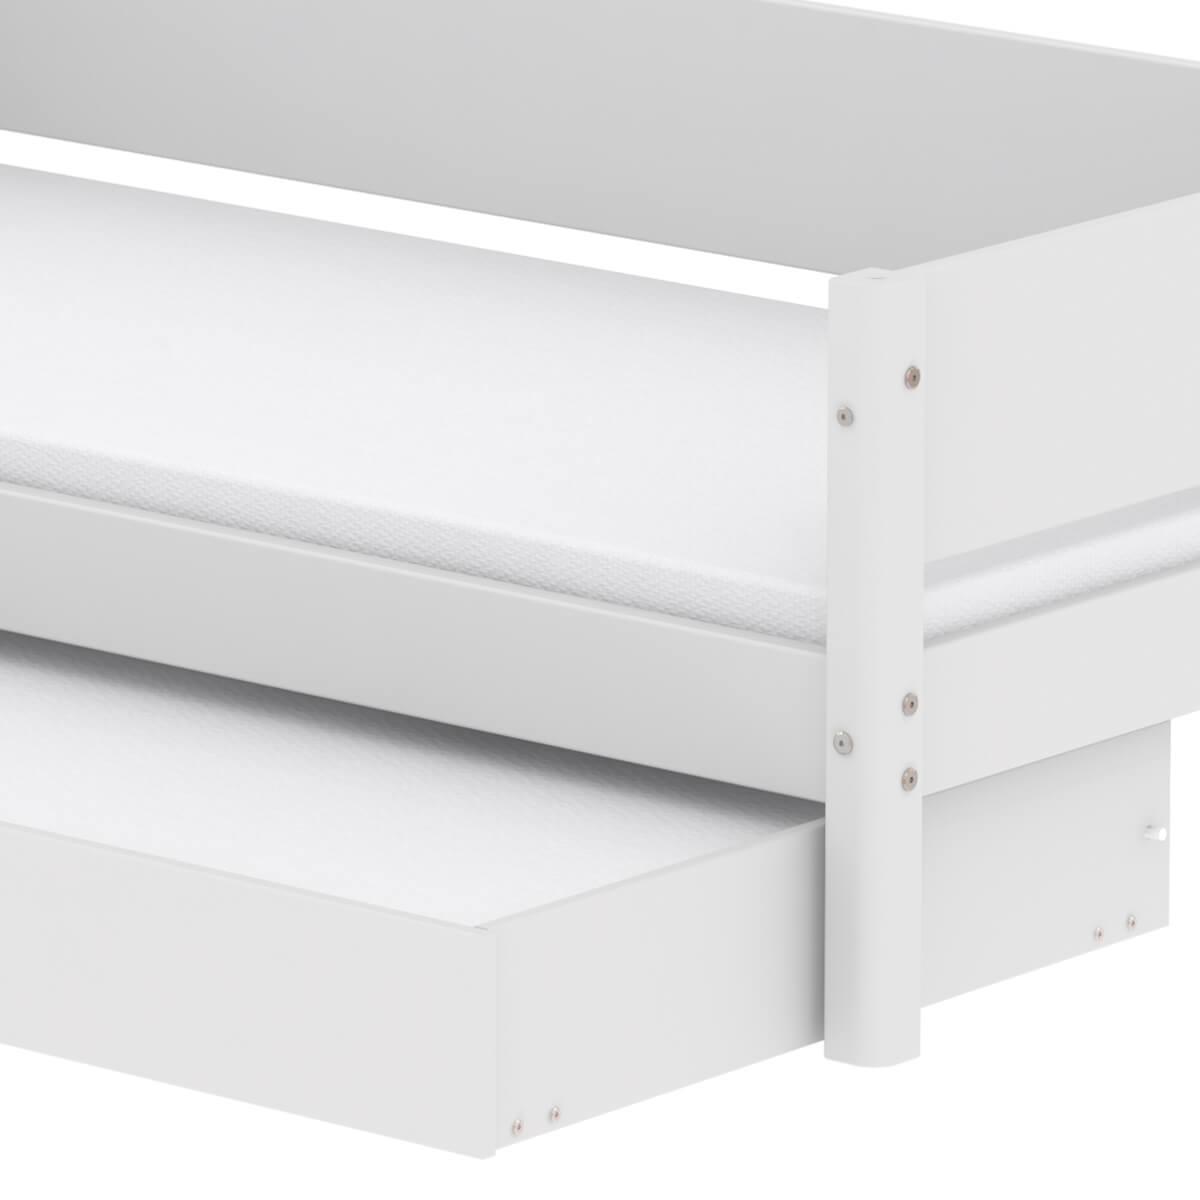 Lit enfant simple 90x200cm lit gigogne WHITE Flexa blanc